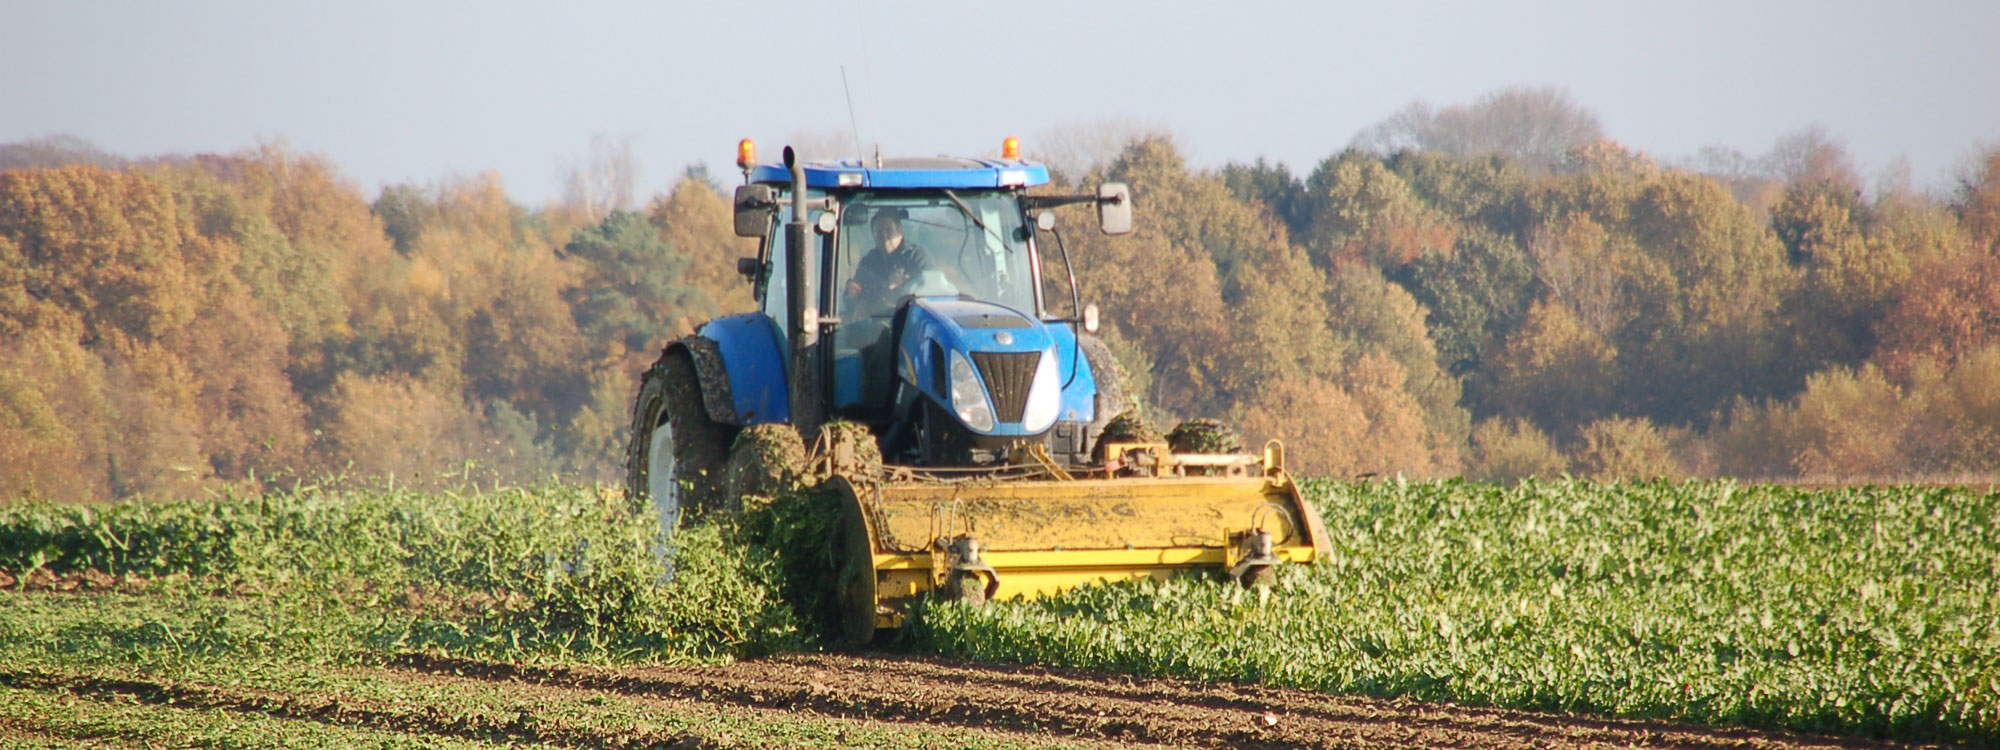 slider-plus-tractor-bg